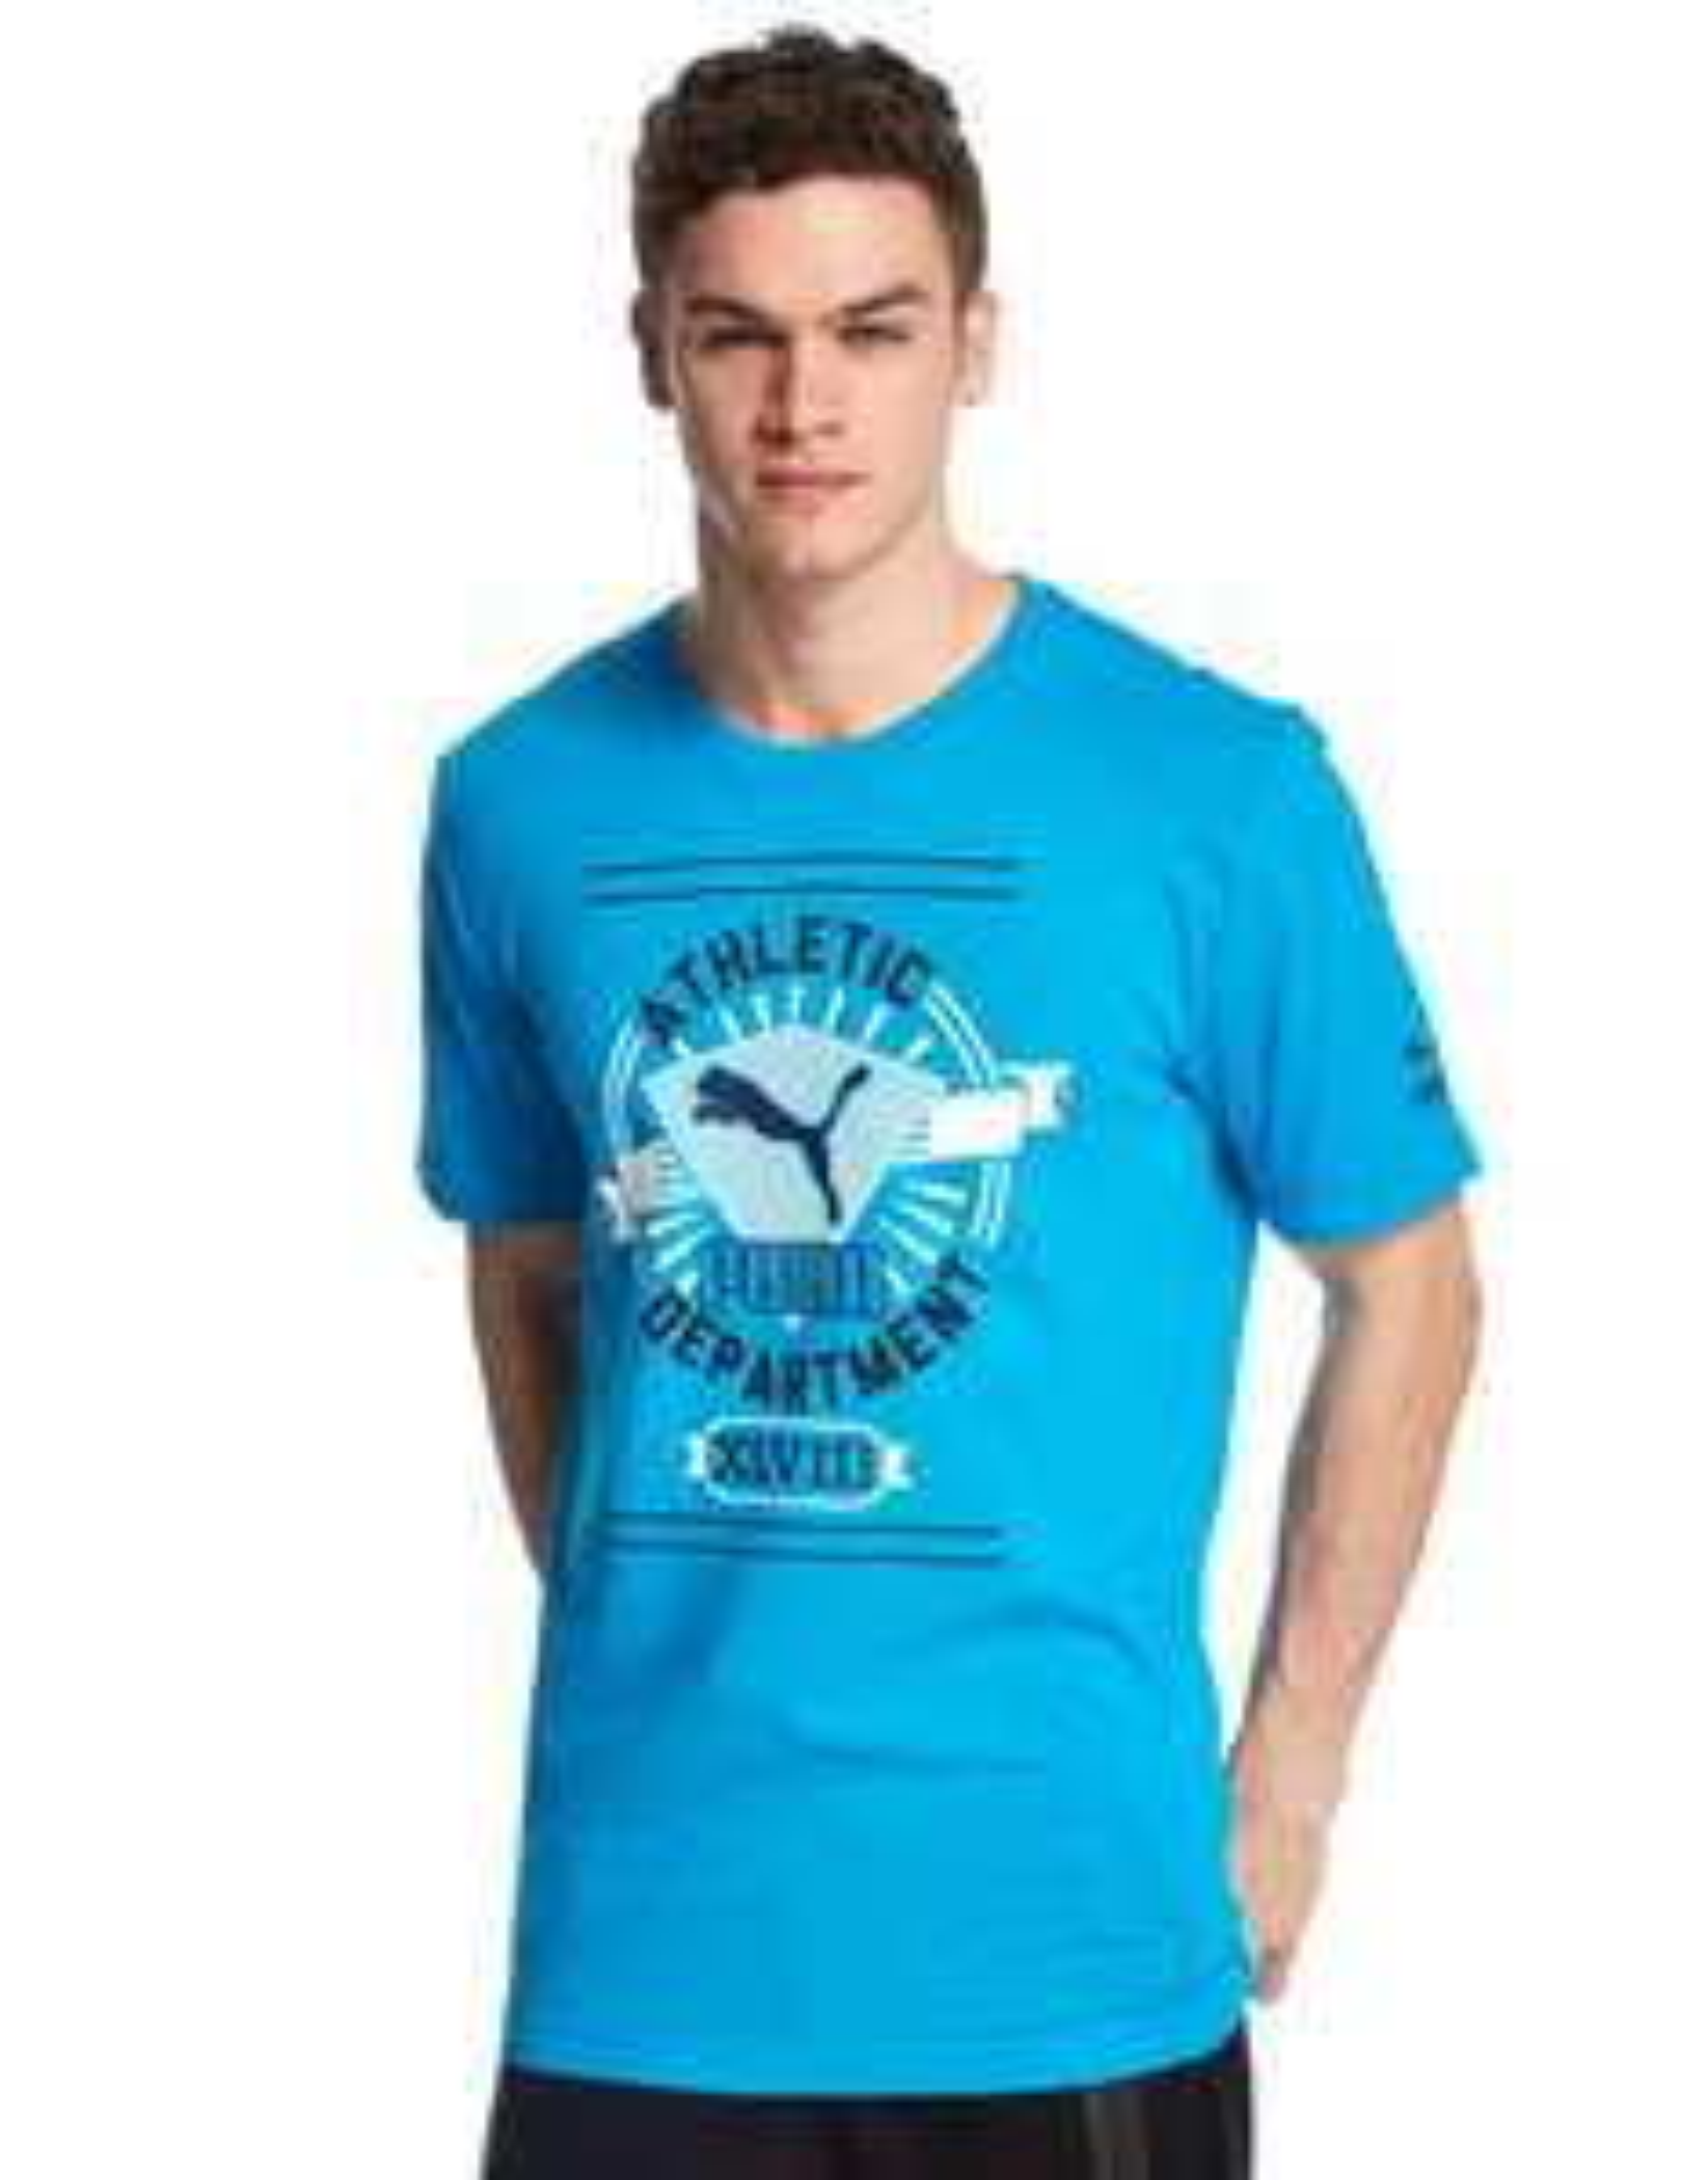 T-Shirt Puma Athletic Department 100% Cotton